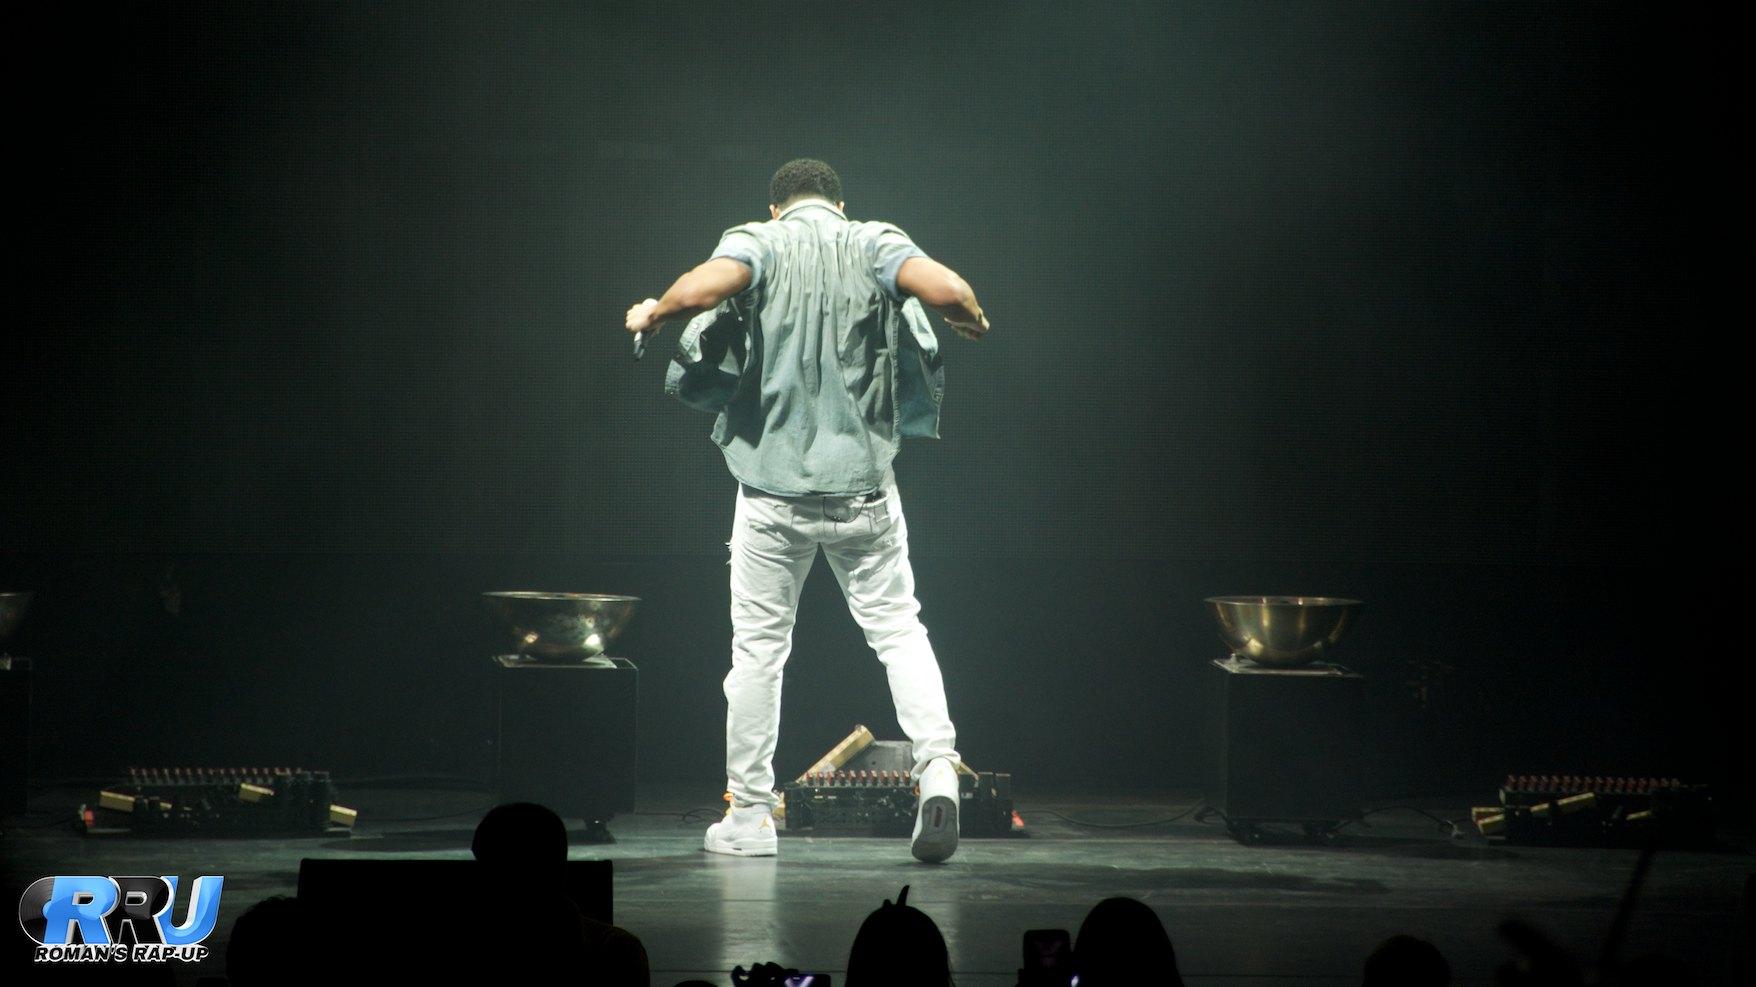 Drake Vs. Lil Wayne 29.jpg